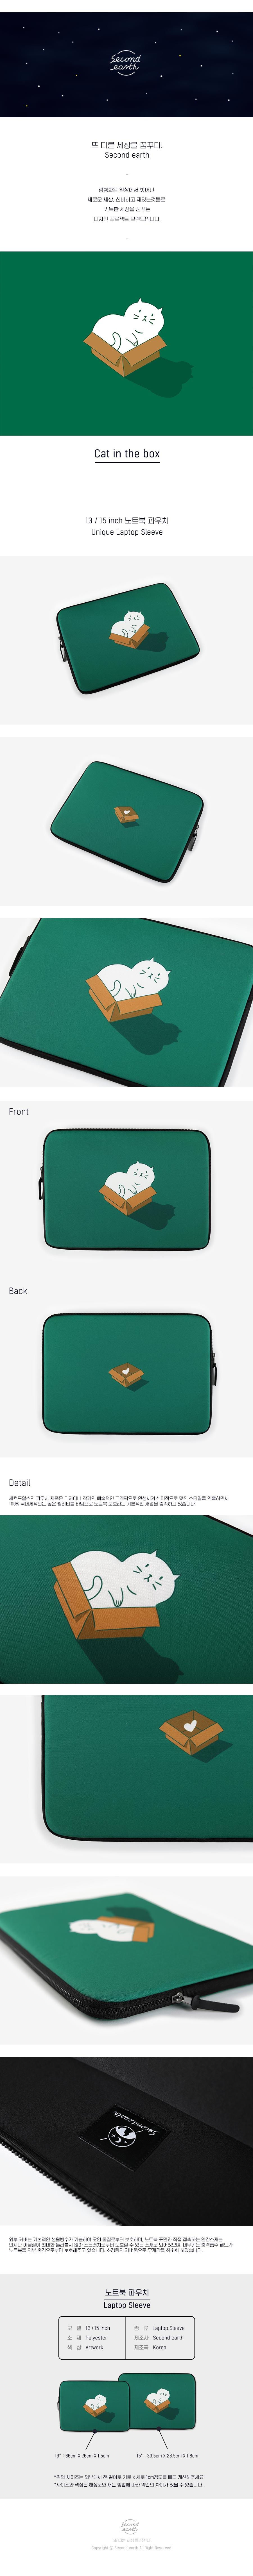 Cat in the box (13-14형)_노트북파우치 - 세컨드얼스, 23,200원, 노트북 케이스/파우치, 27.94cm~33.78cm